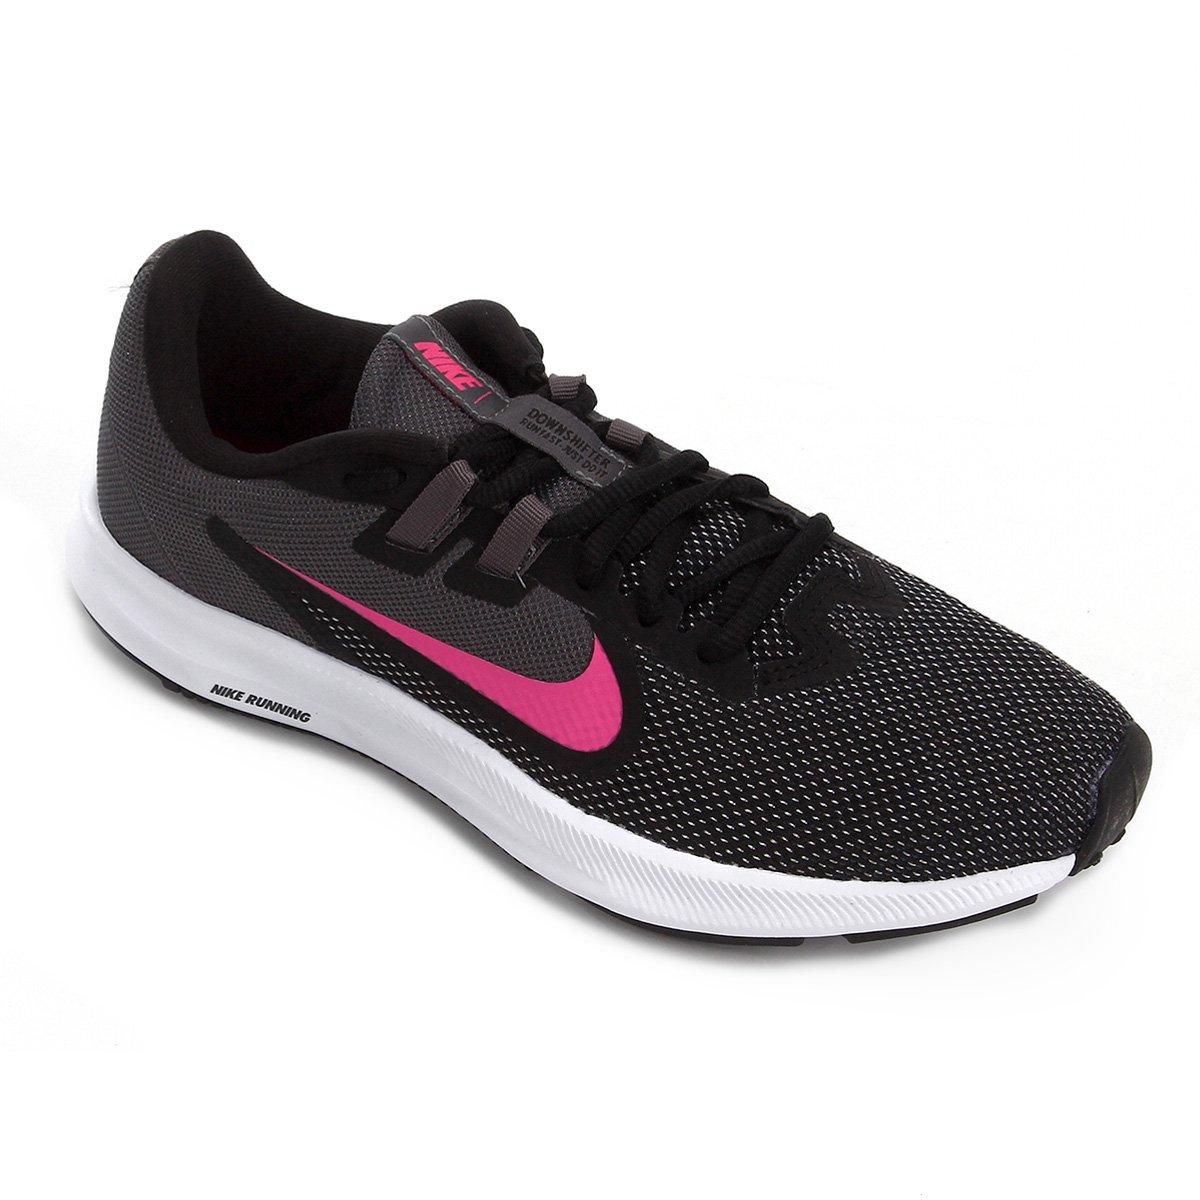 Tênis Nike Downshifter 9 Feminino Preto E Branco Zattini